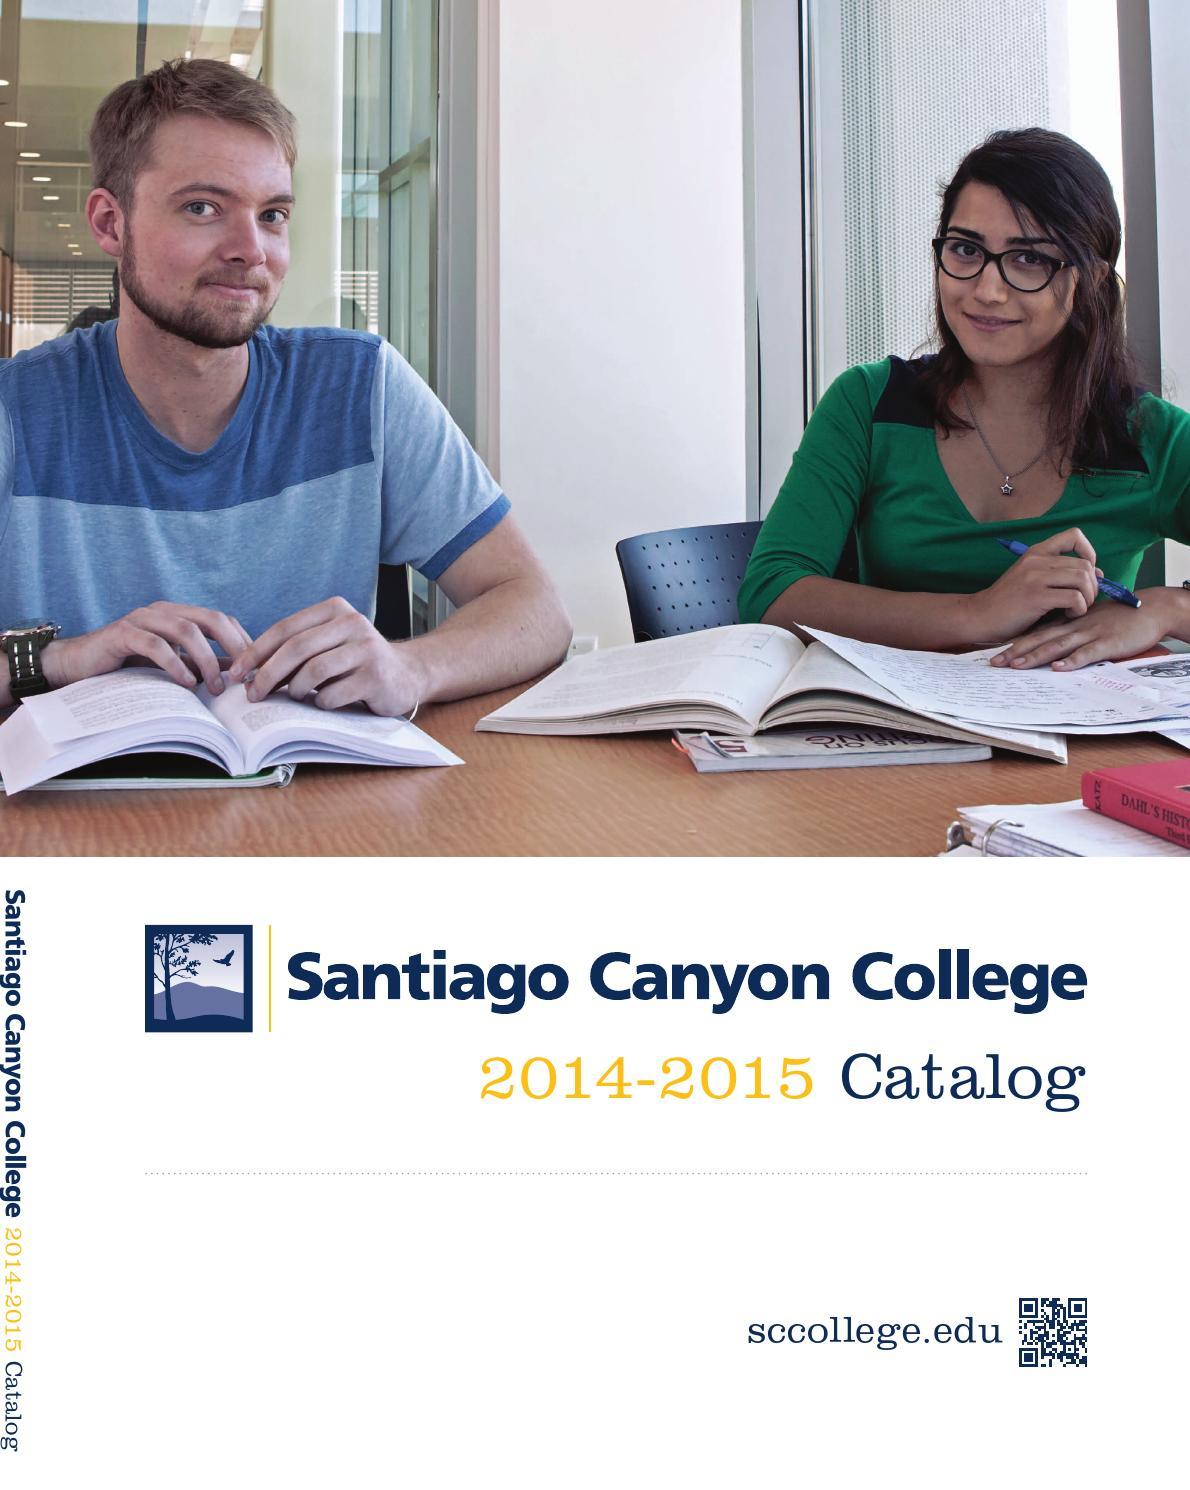 Santiago Canyon College Catalog 2014 15 By Mig Welding Forum Also Welder Single Phase Rectifier Wiring Diagram Issuu